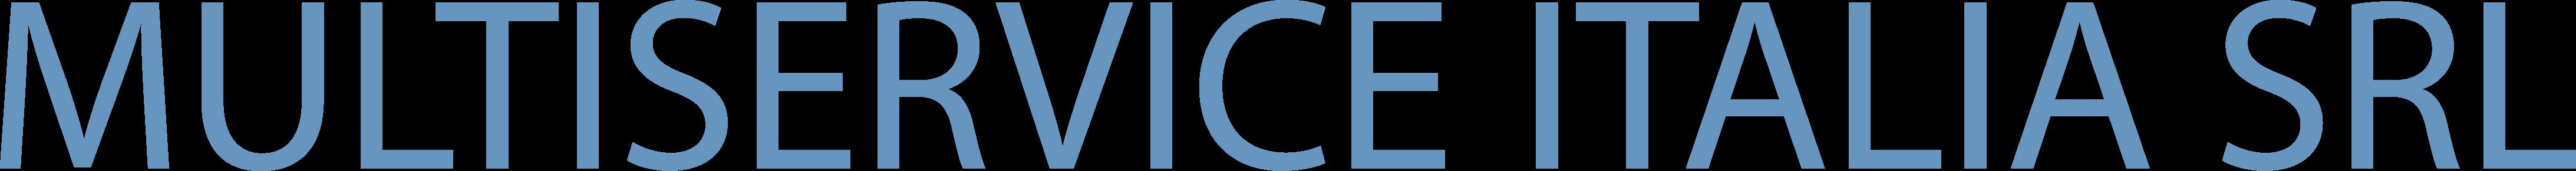 Multiservice Italia srl Logo